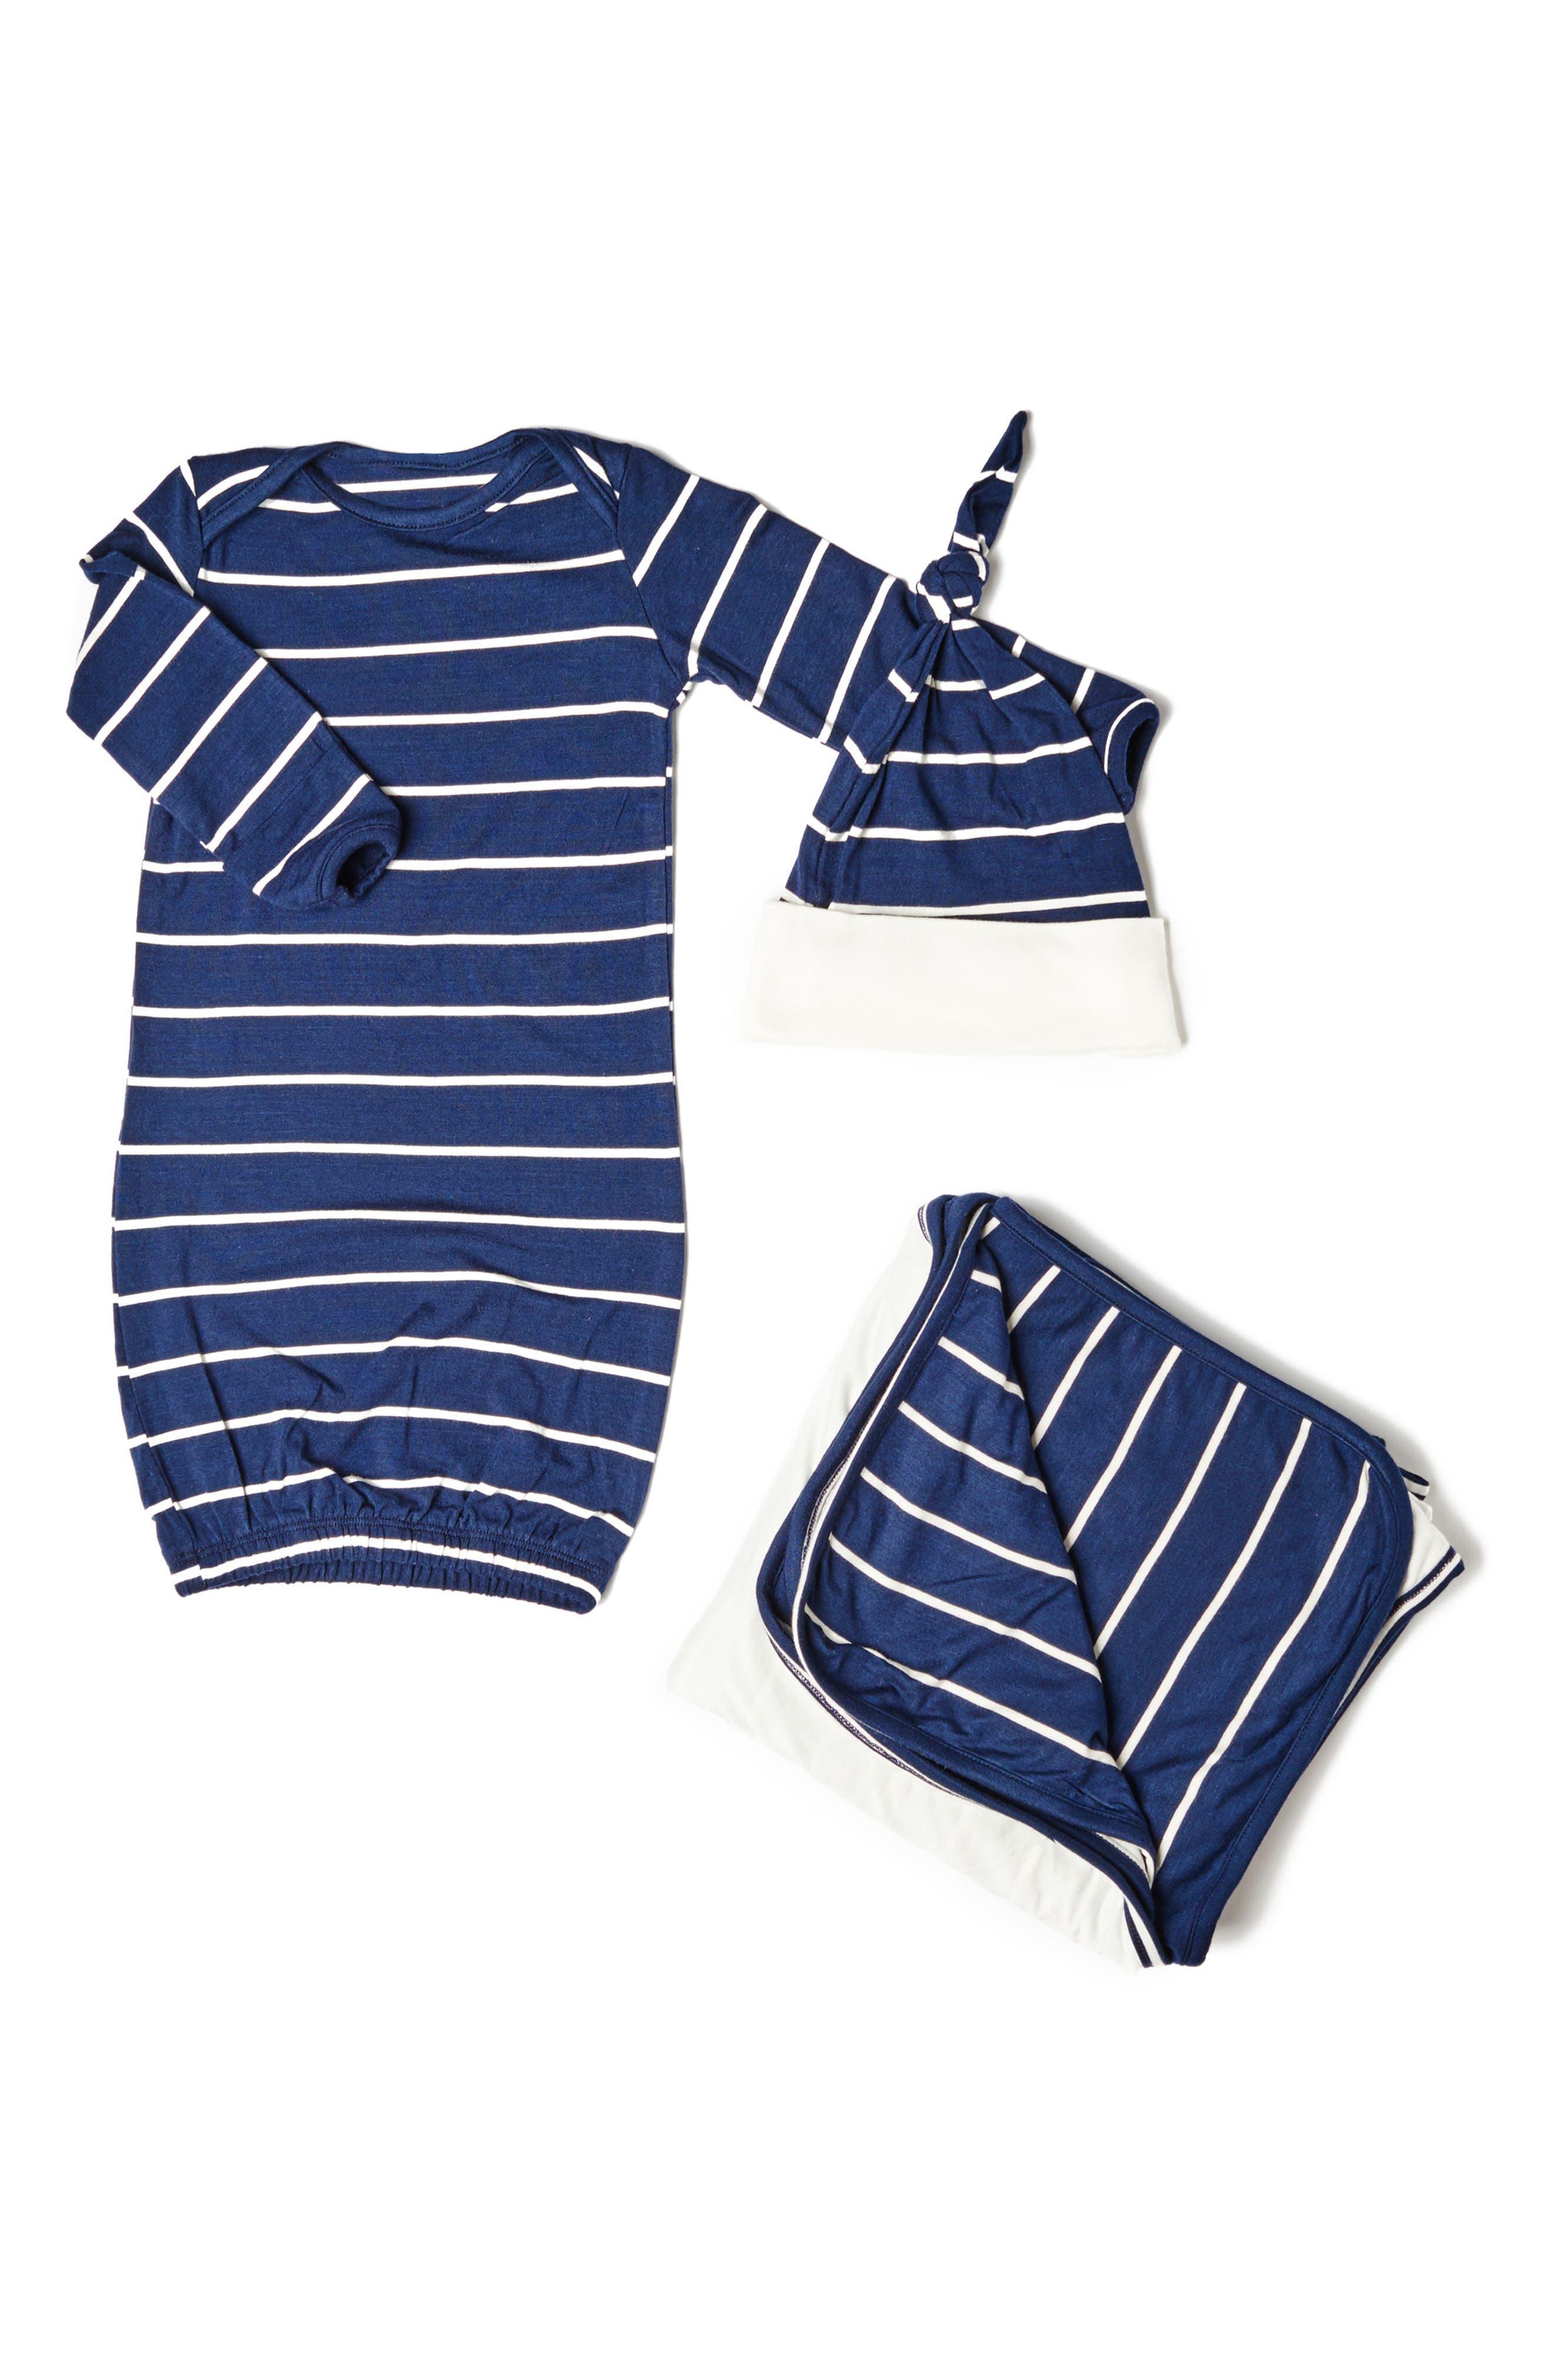 Alternate Image 1 Selected - Baby Grey Gown, Blanket & Hat Set (Baby Boys)